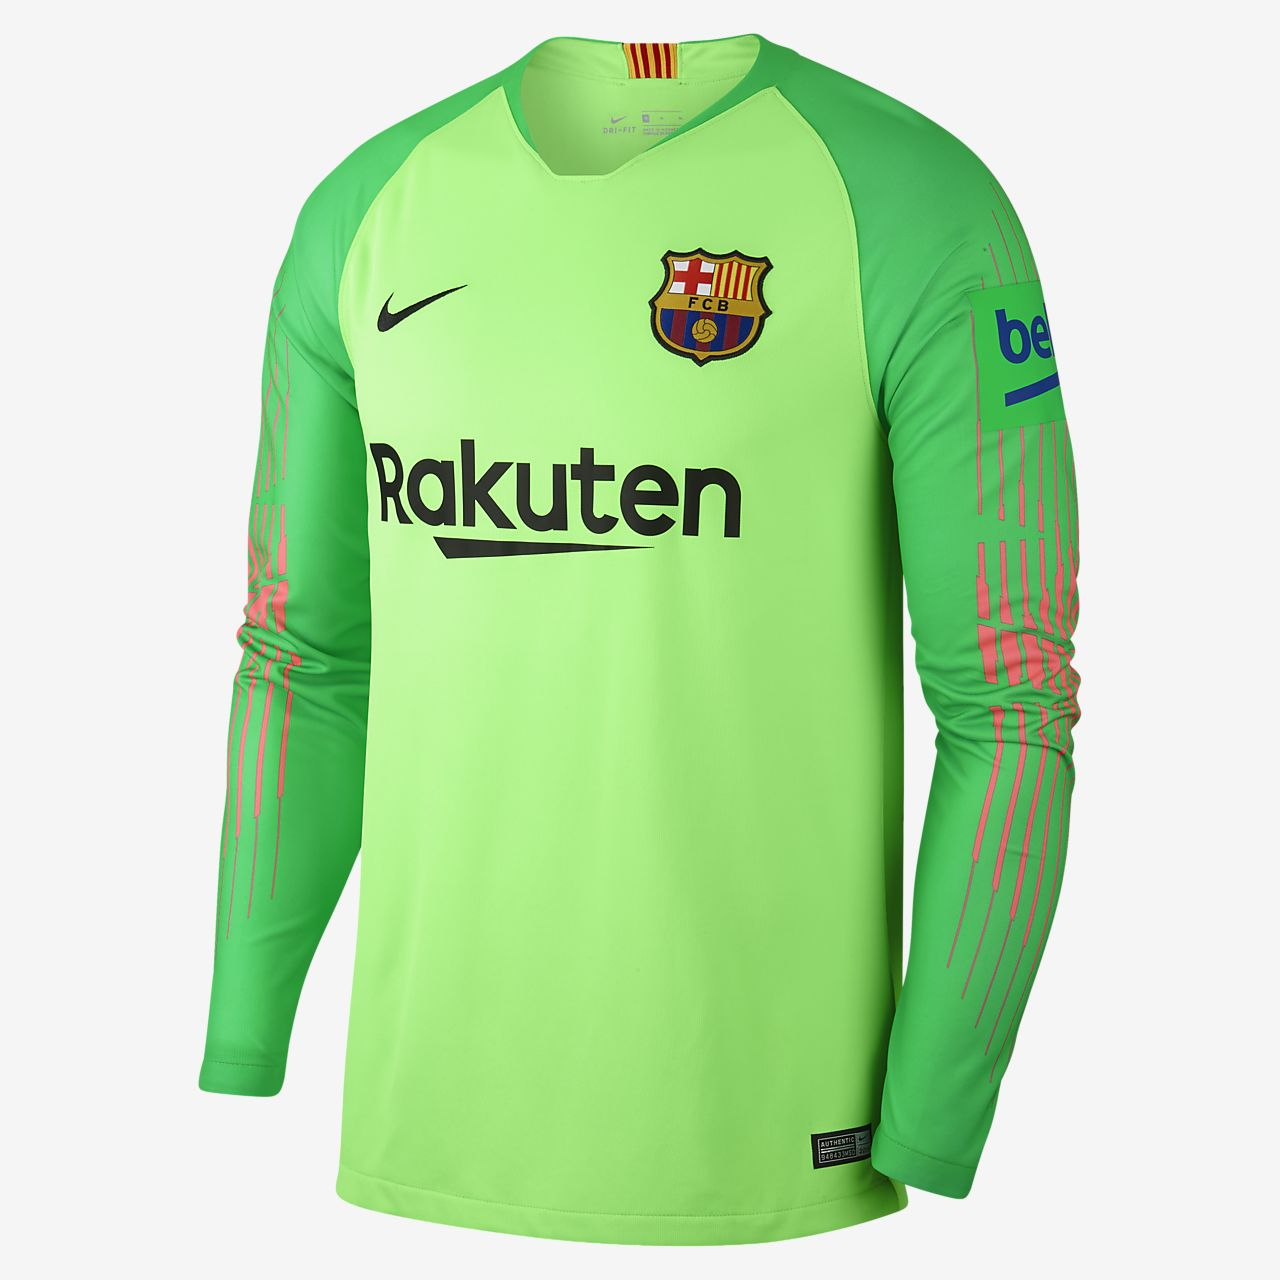 232b5c6cf Maglia da calcio 2018 19 FC Barcelona Stadium Goalkeeper - Uomo